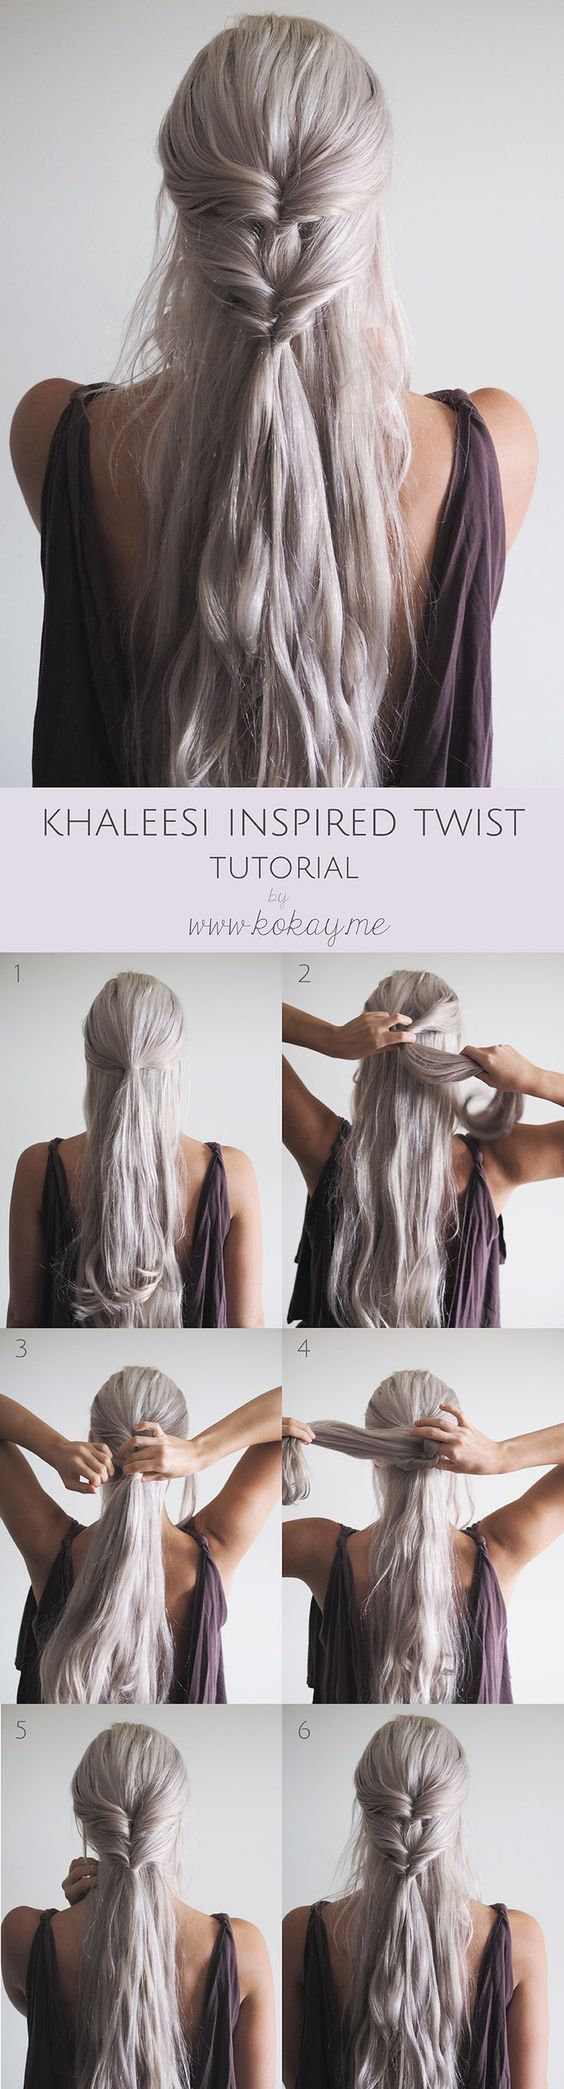 Peinado khalessi